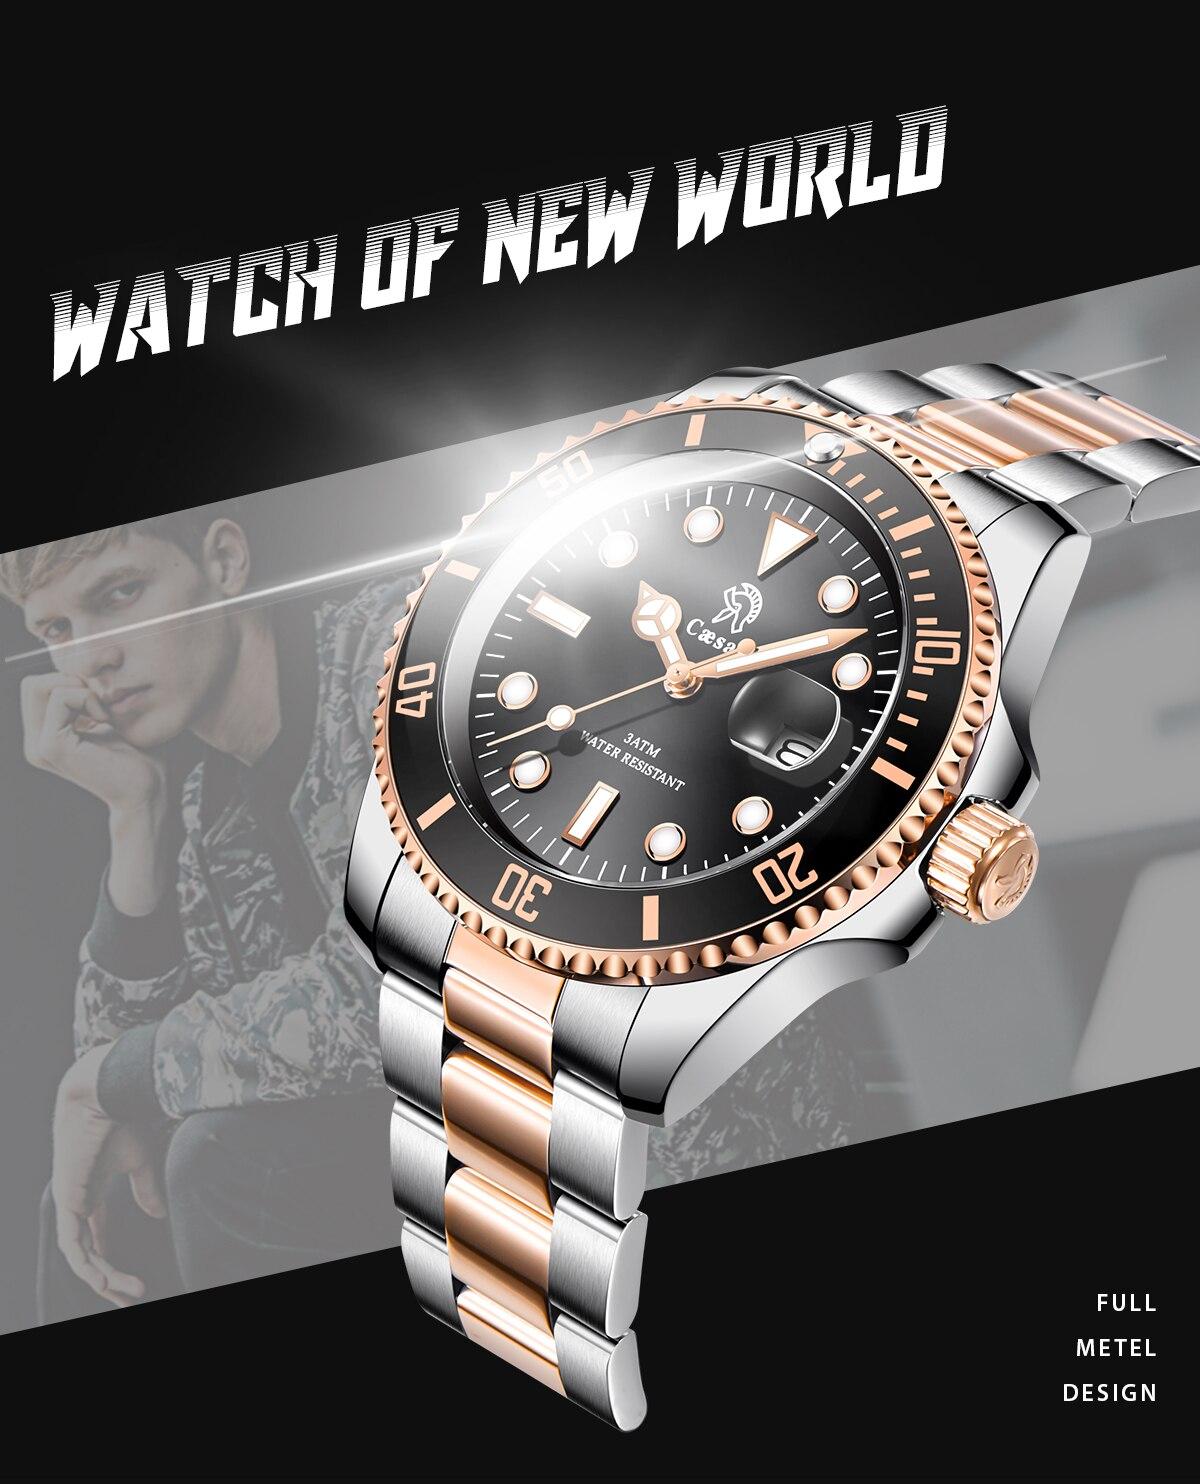 Hd758ca119ba54f82afe742a0e7d5cf49Y Rose Gold caesar  Top Brand Luxury Watches